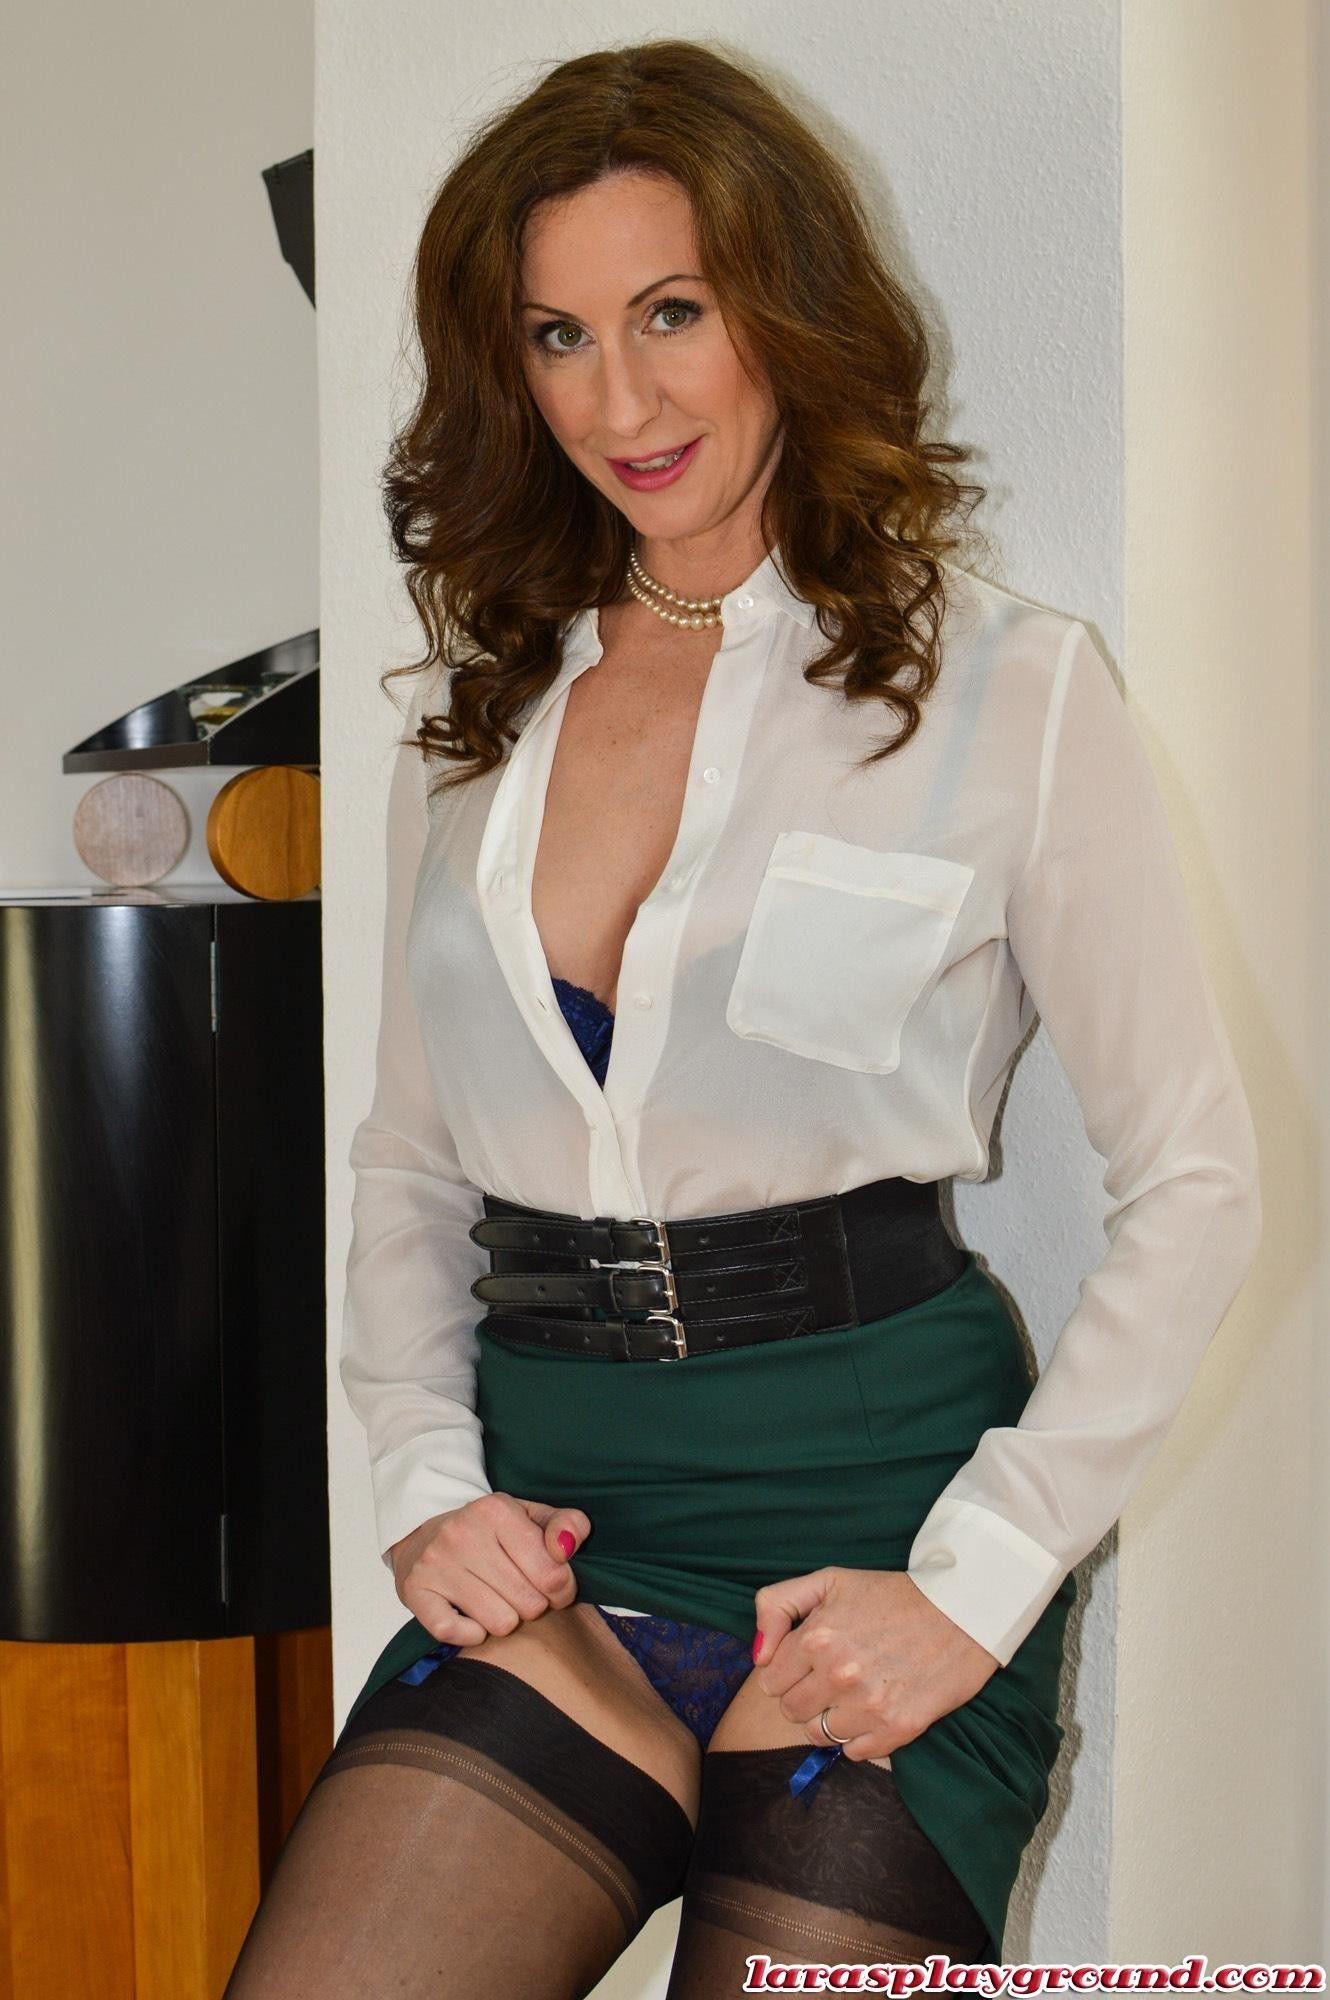 Babe Lara Porn Star lara latex - free pics, videos & biography